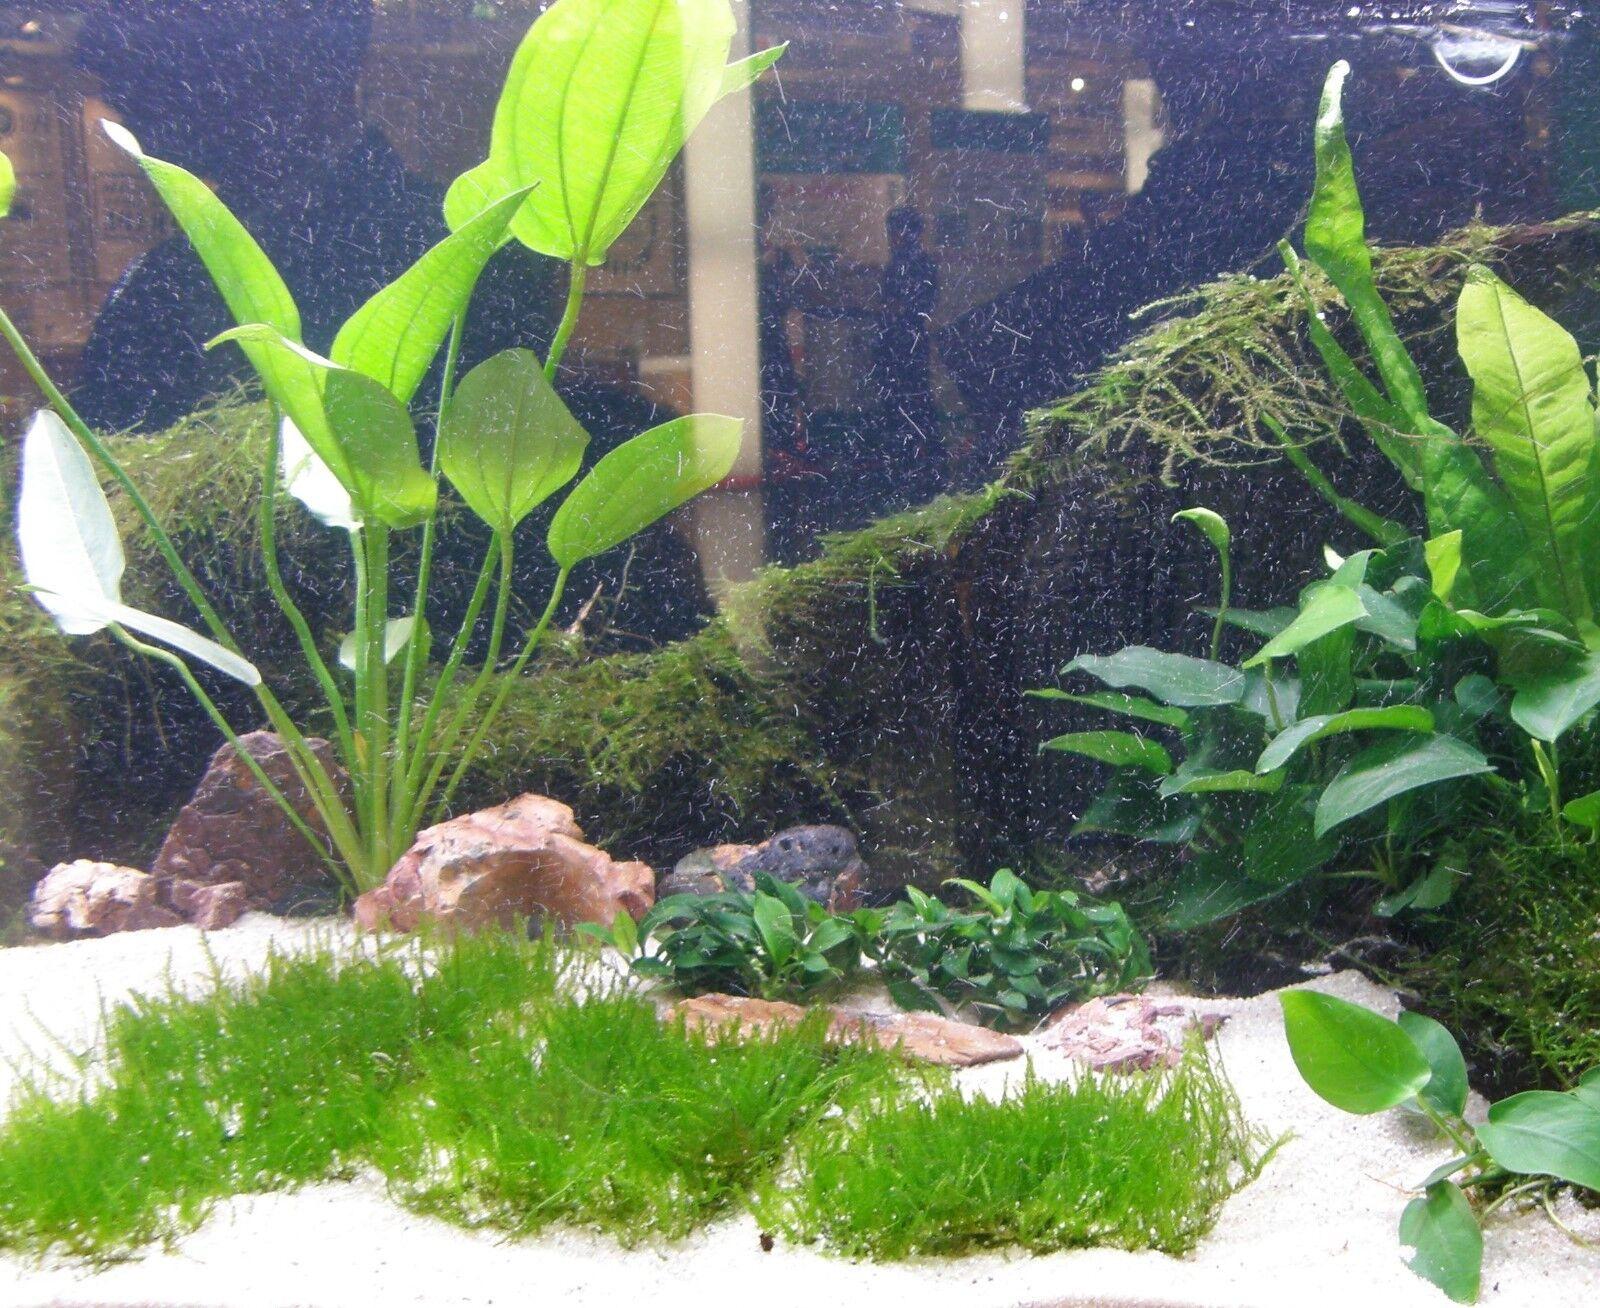 20 MATTEN NEUSEELANDGRAS (7x5 cm), Aquariumpflanzen, Wasserpflanzen, Aquarium